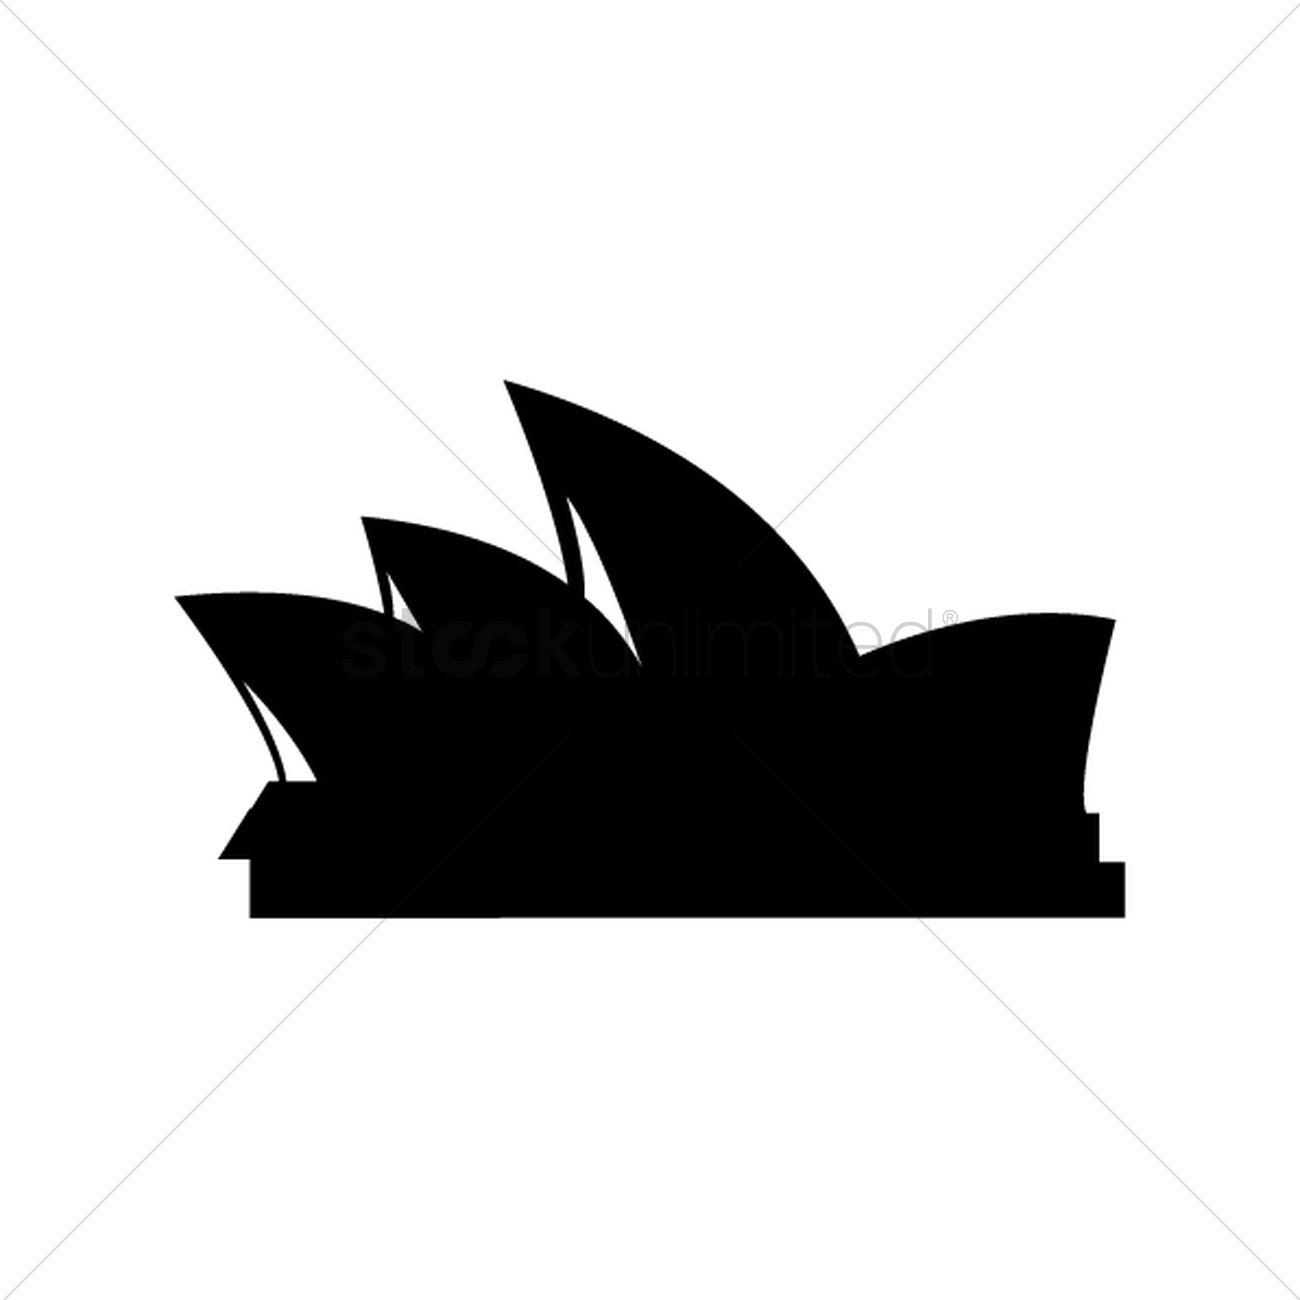 File:Sydney opera house 2010.jpg - Wikimedia Commons